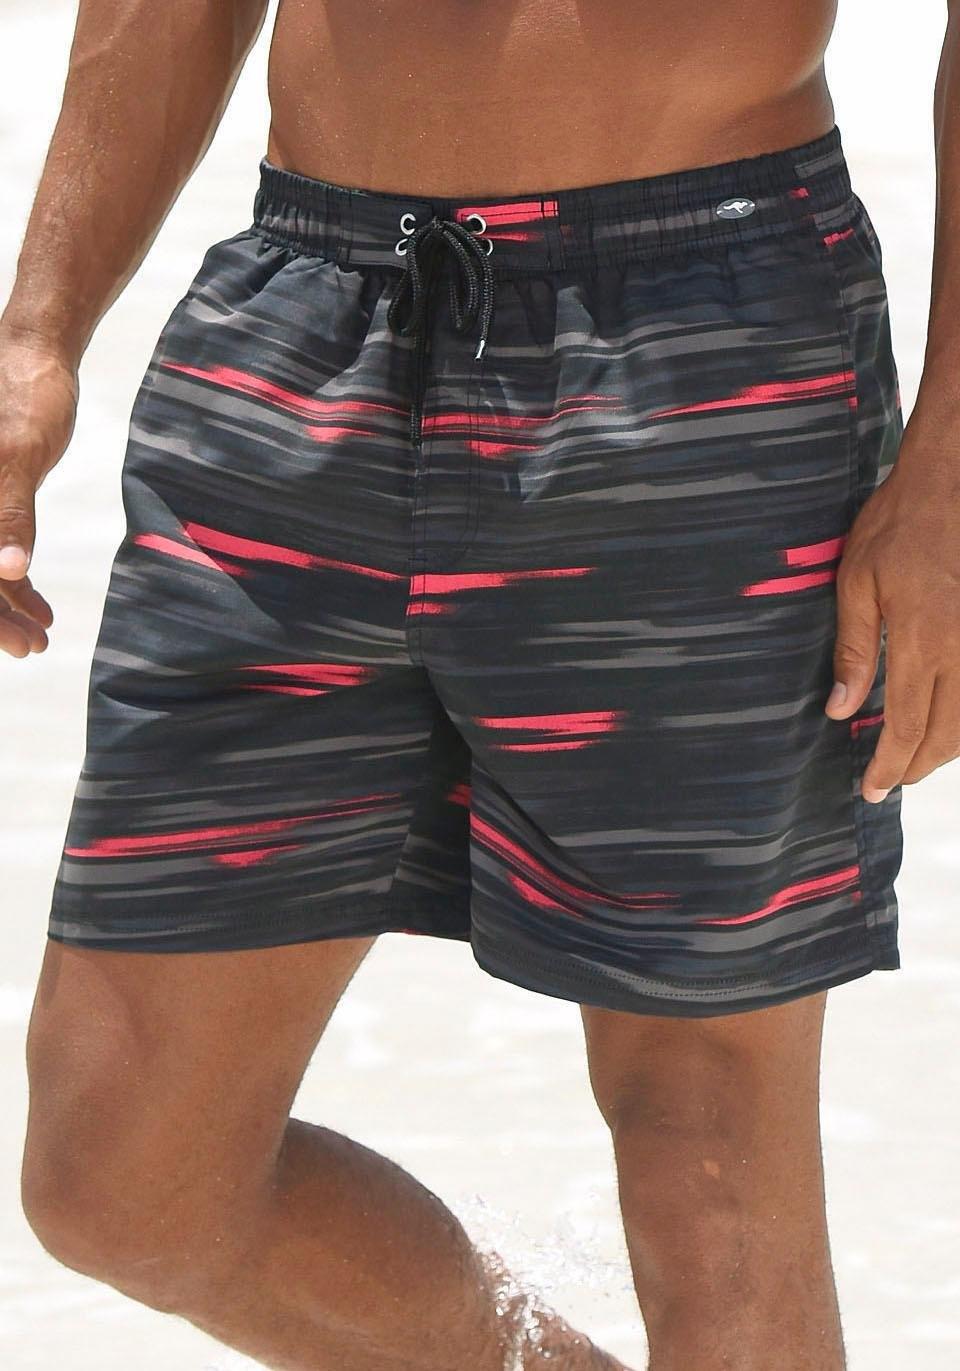 Zwarte Zwembroek Heren.Zwarte Zwemshort Online Kopen Shop Nu Otto